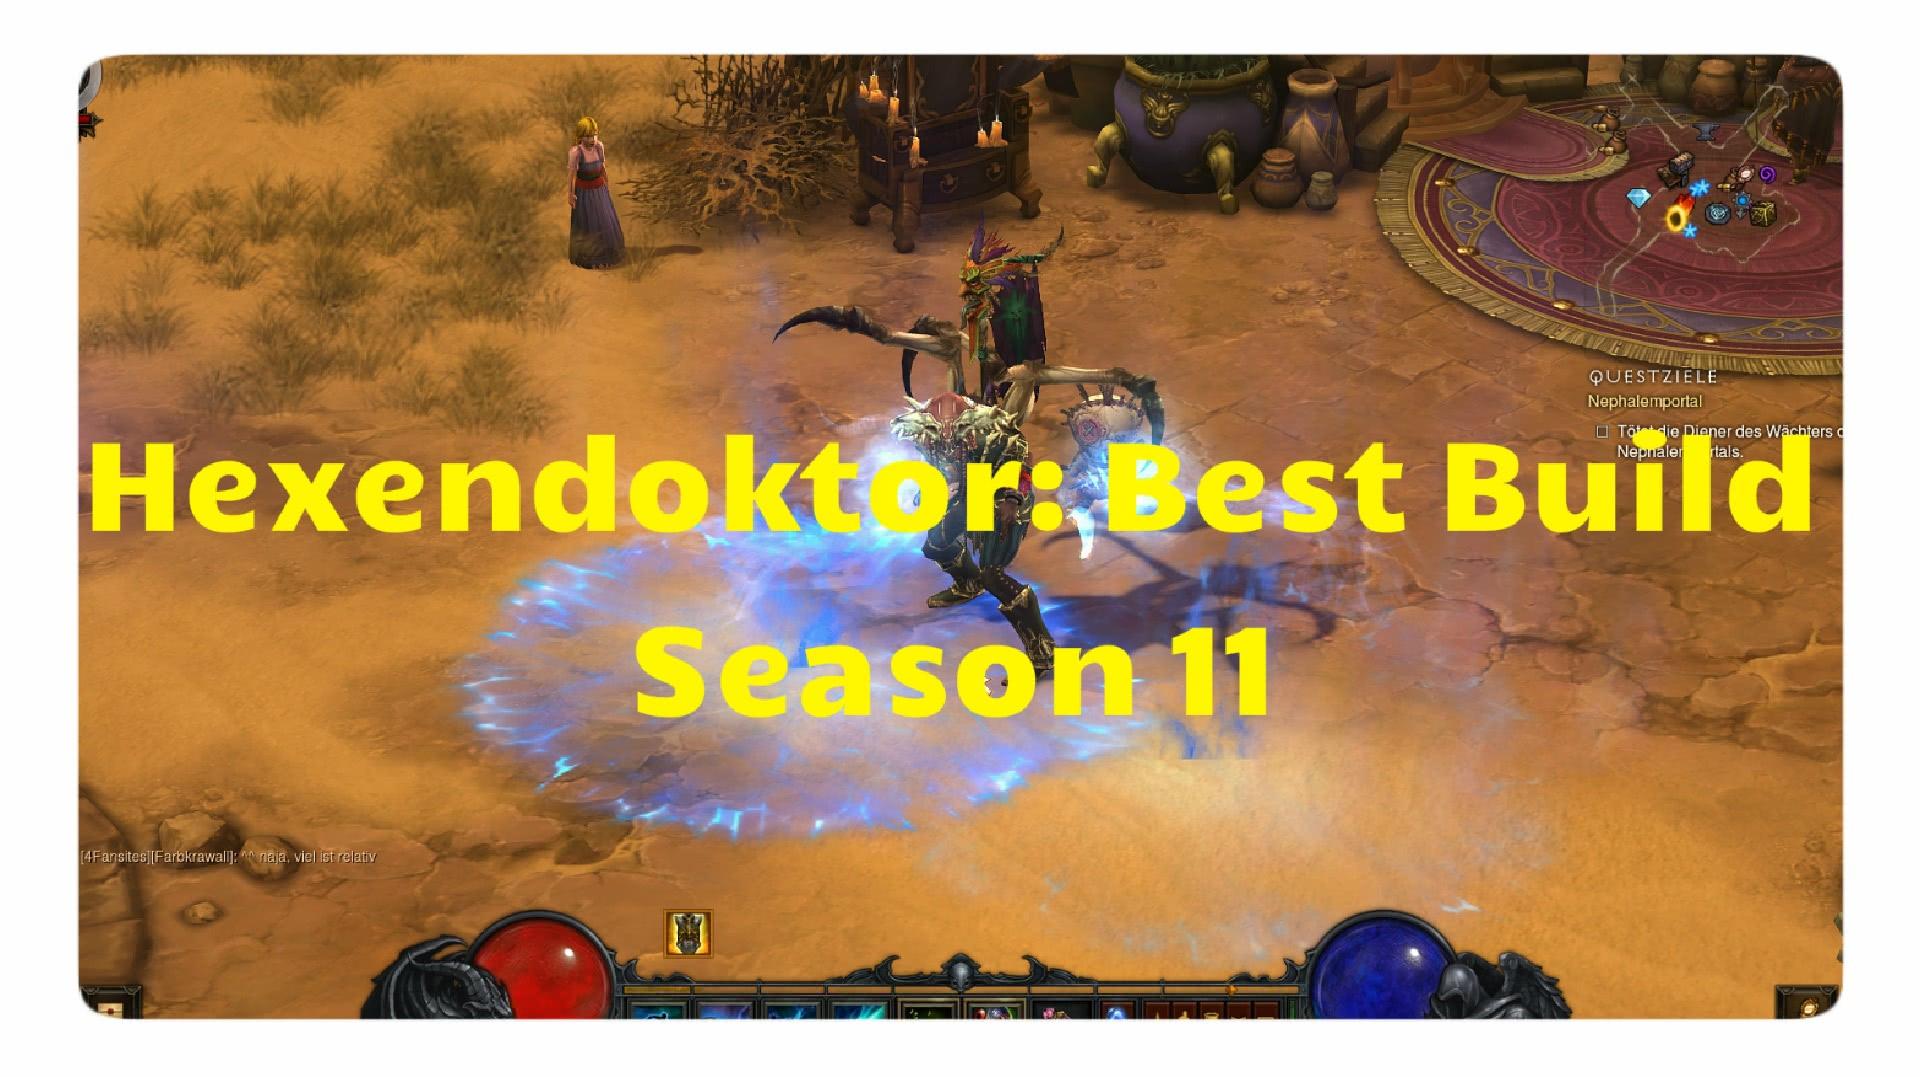 Image Result For Diablo Season Best Build Hexendokto